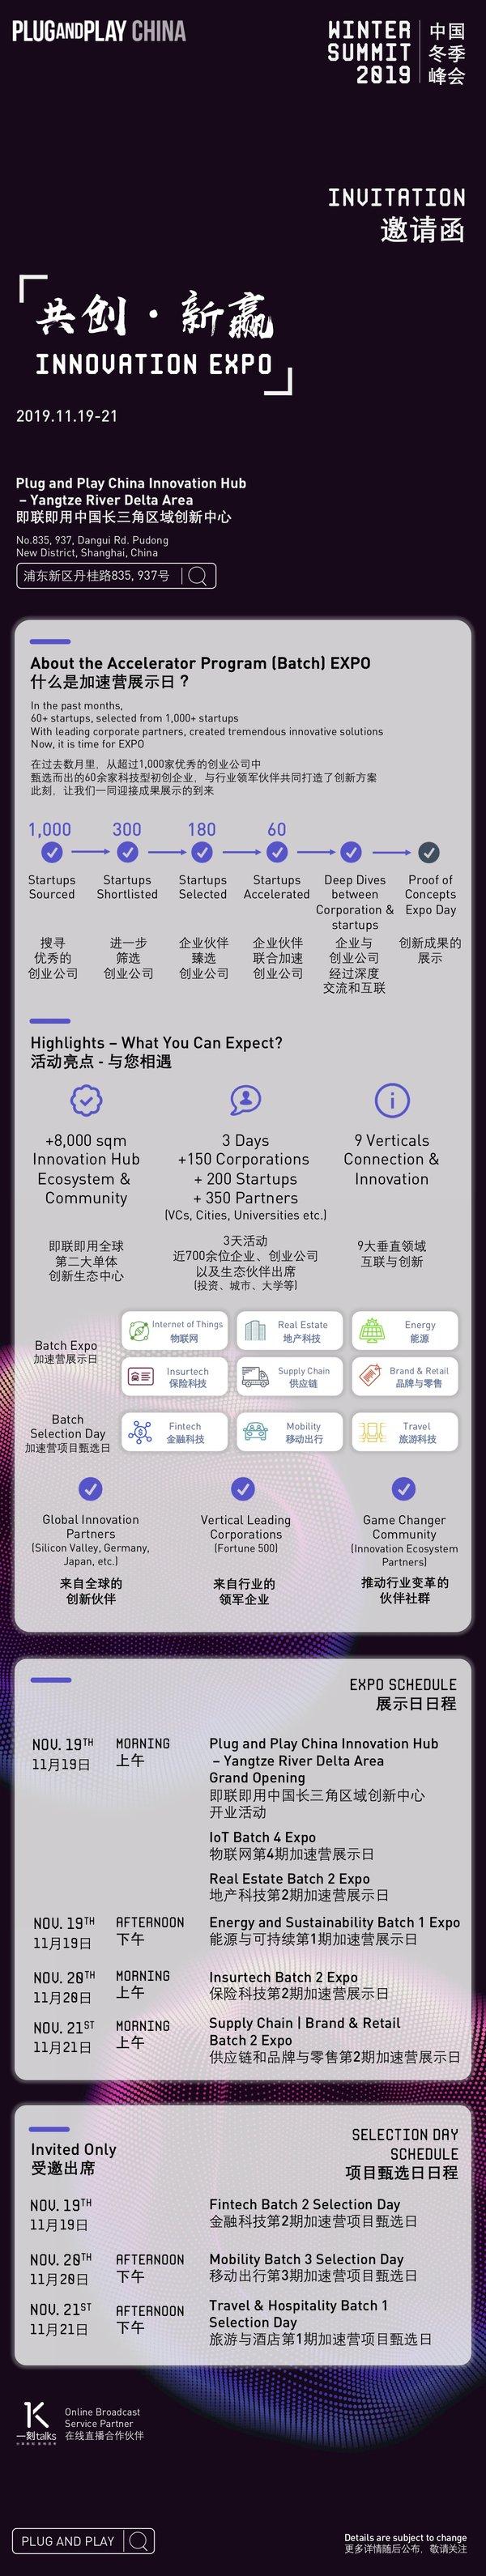 2019 Plug and Play中国冬季峰会正式拉开序幕,早鸟票同步开售